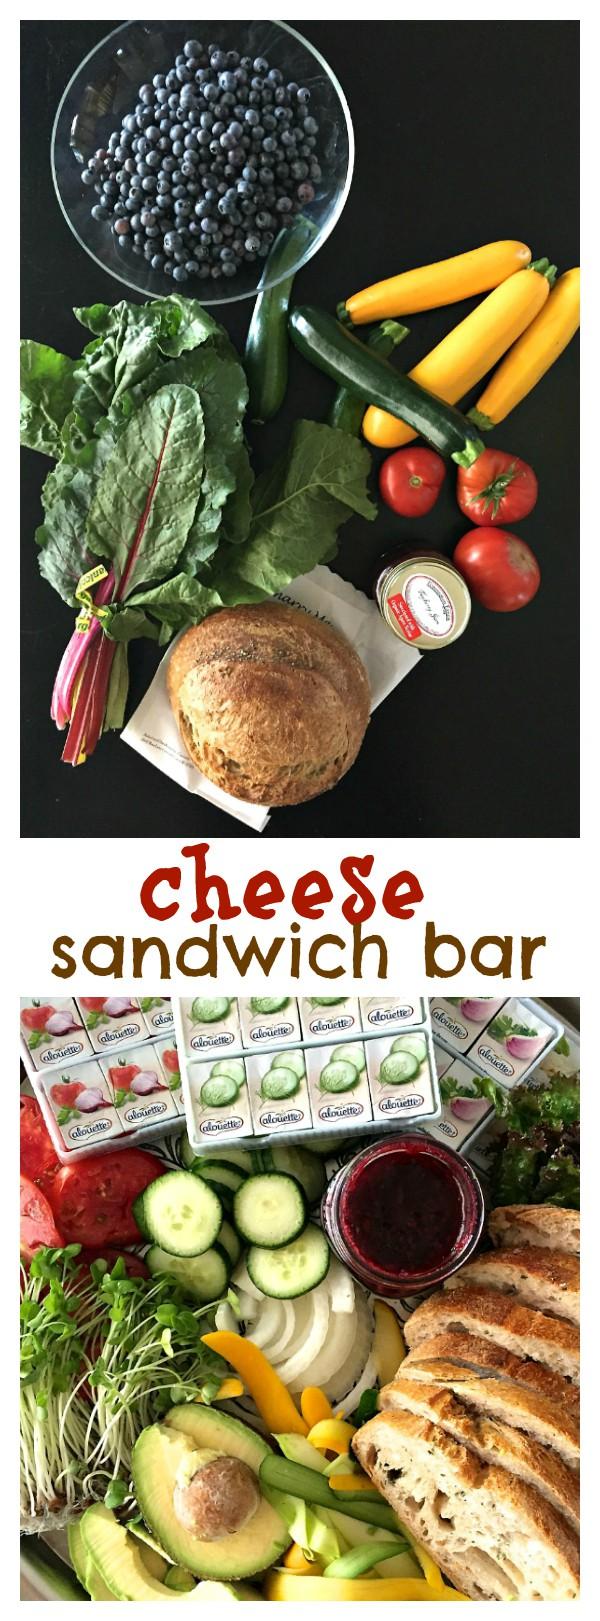 Alouette Cheese Sandwich Bar